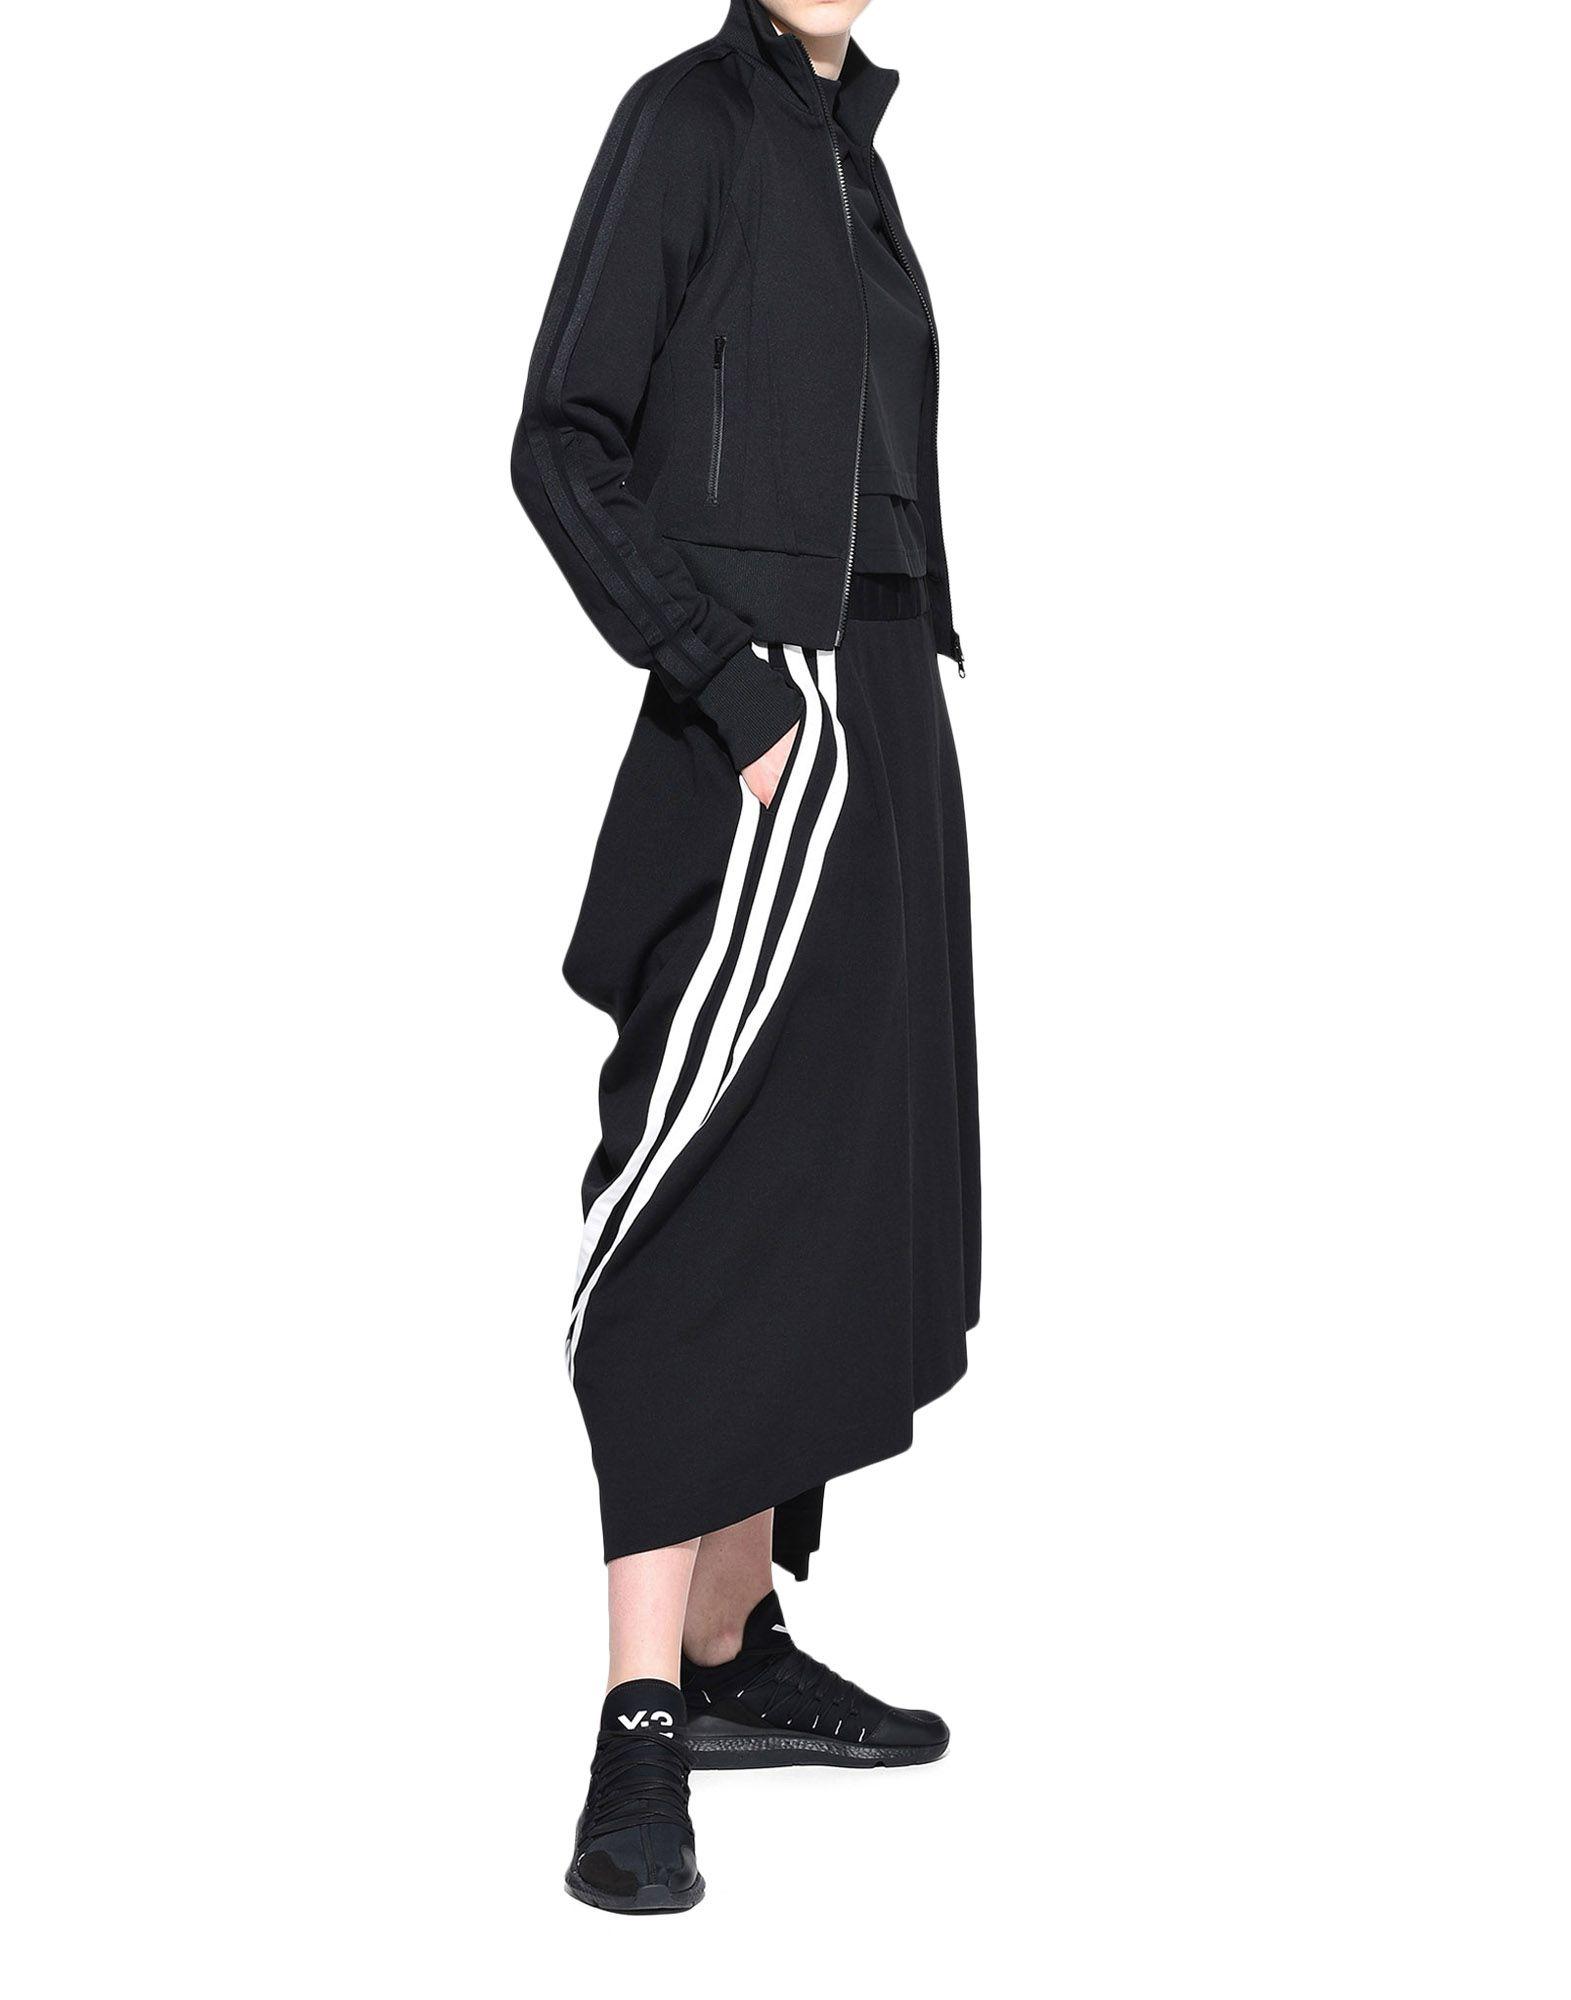 Y-3 Y-3 3-Stripes Drape Skirt Knee length skirt Woman a